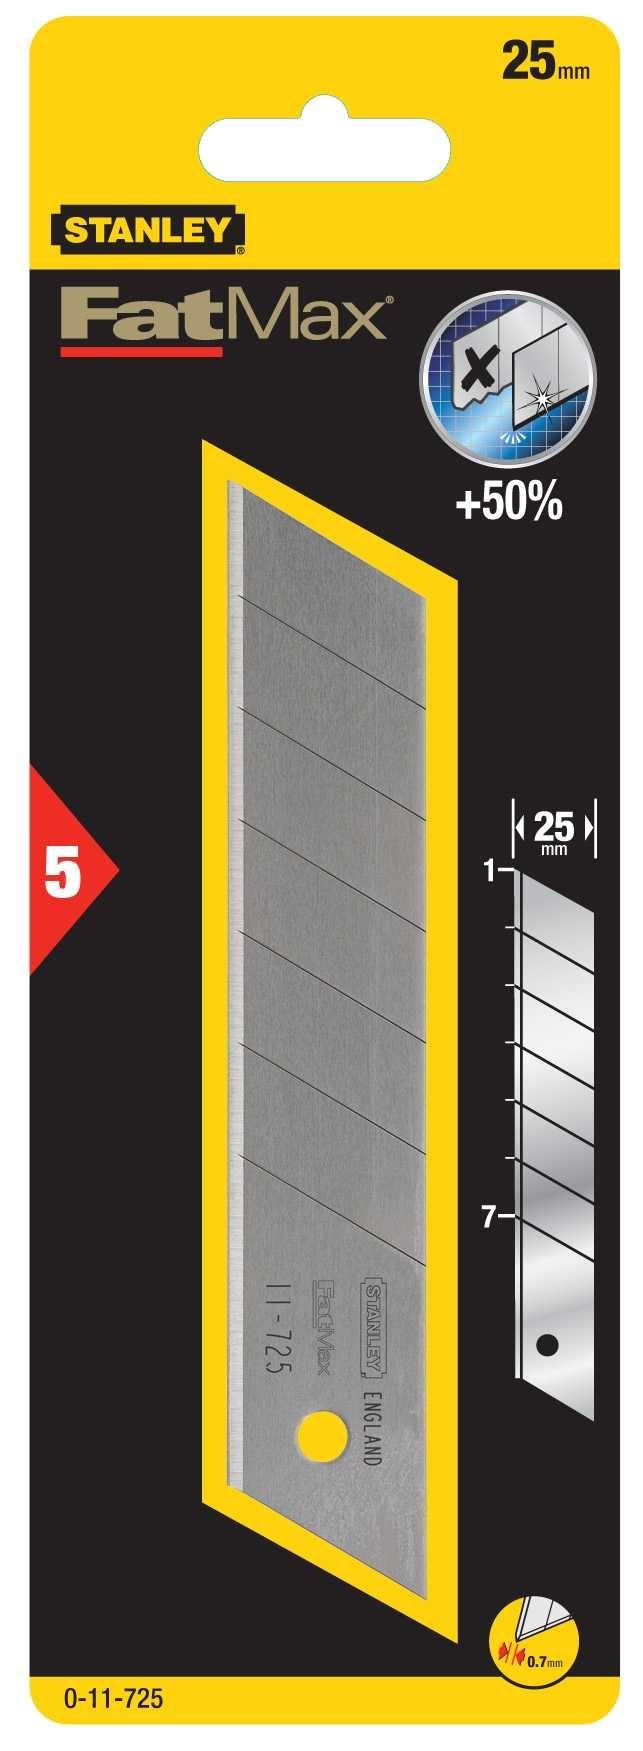 FatMax Reserve Afbreekmes 25mm (5 stuks)